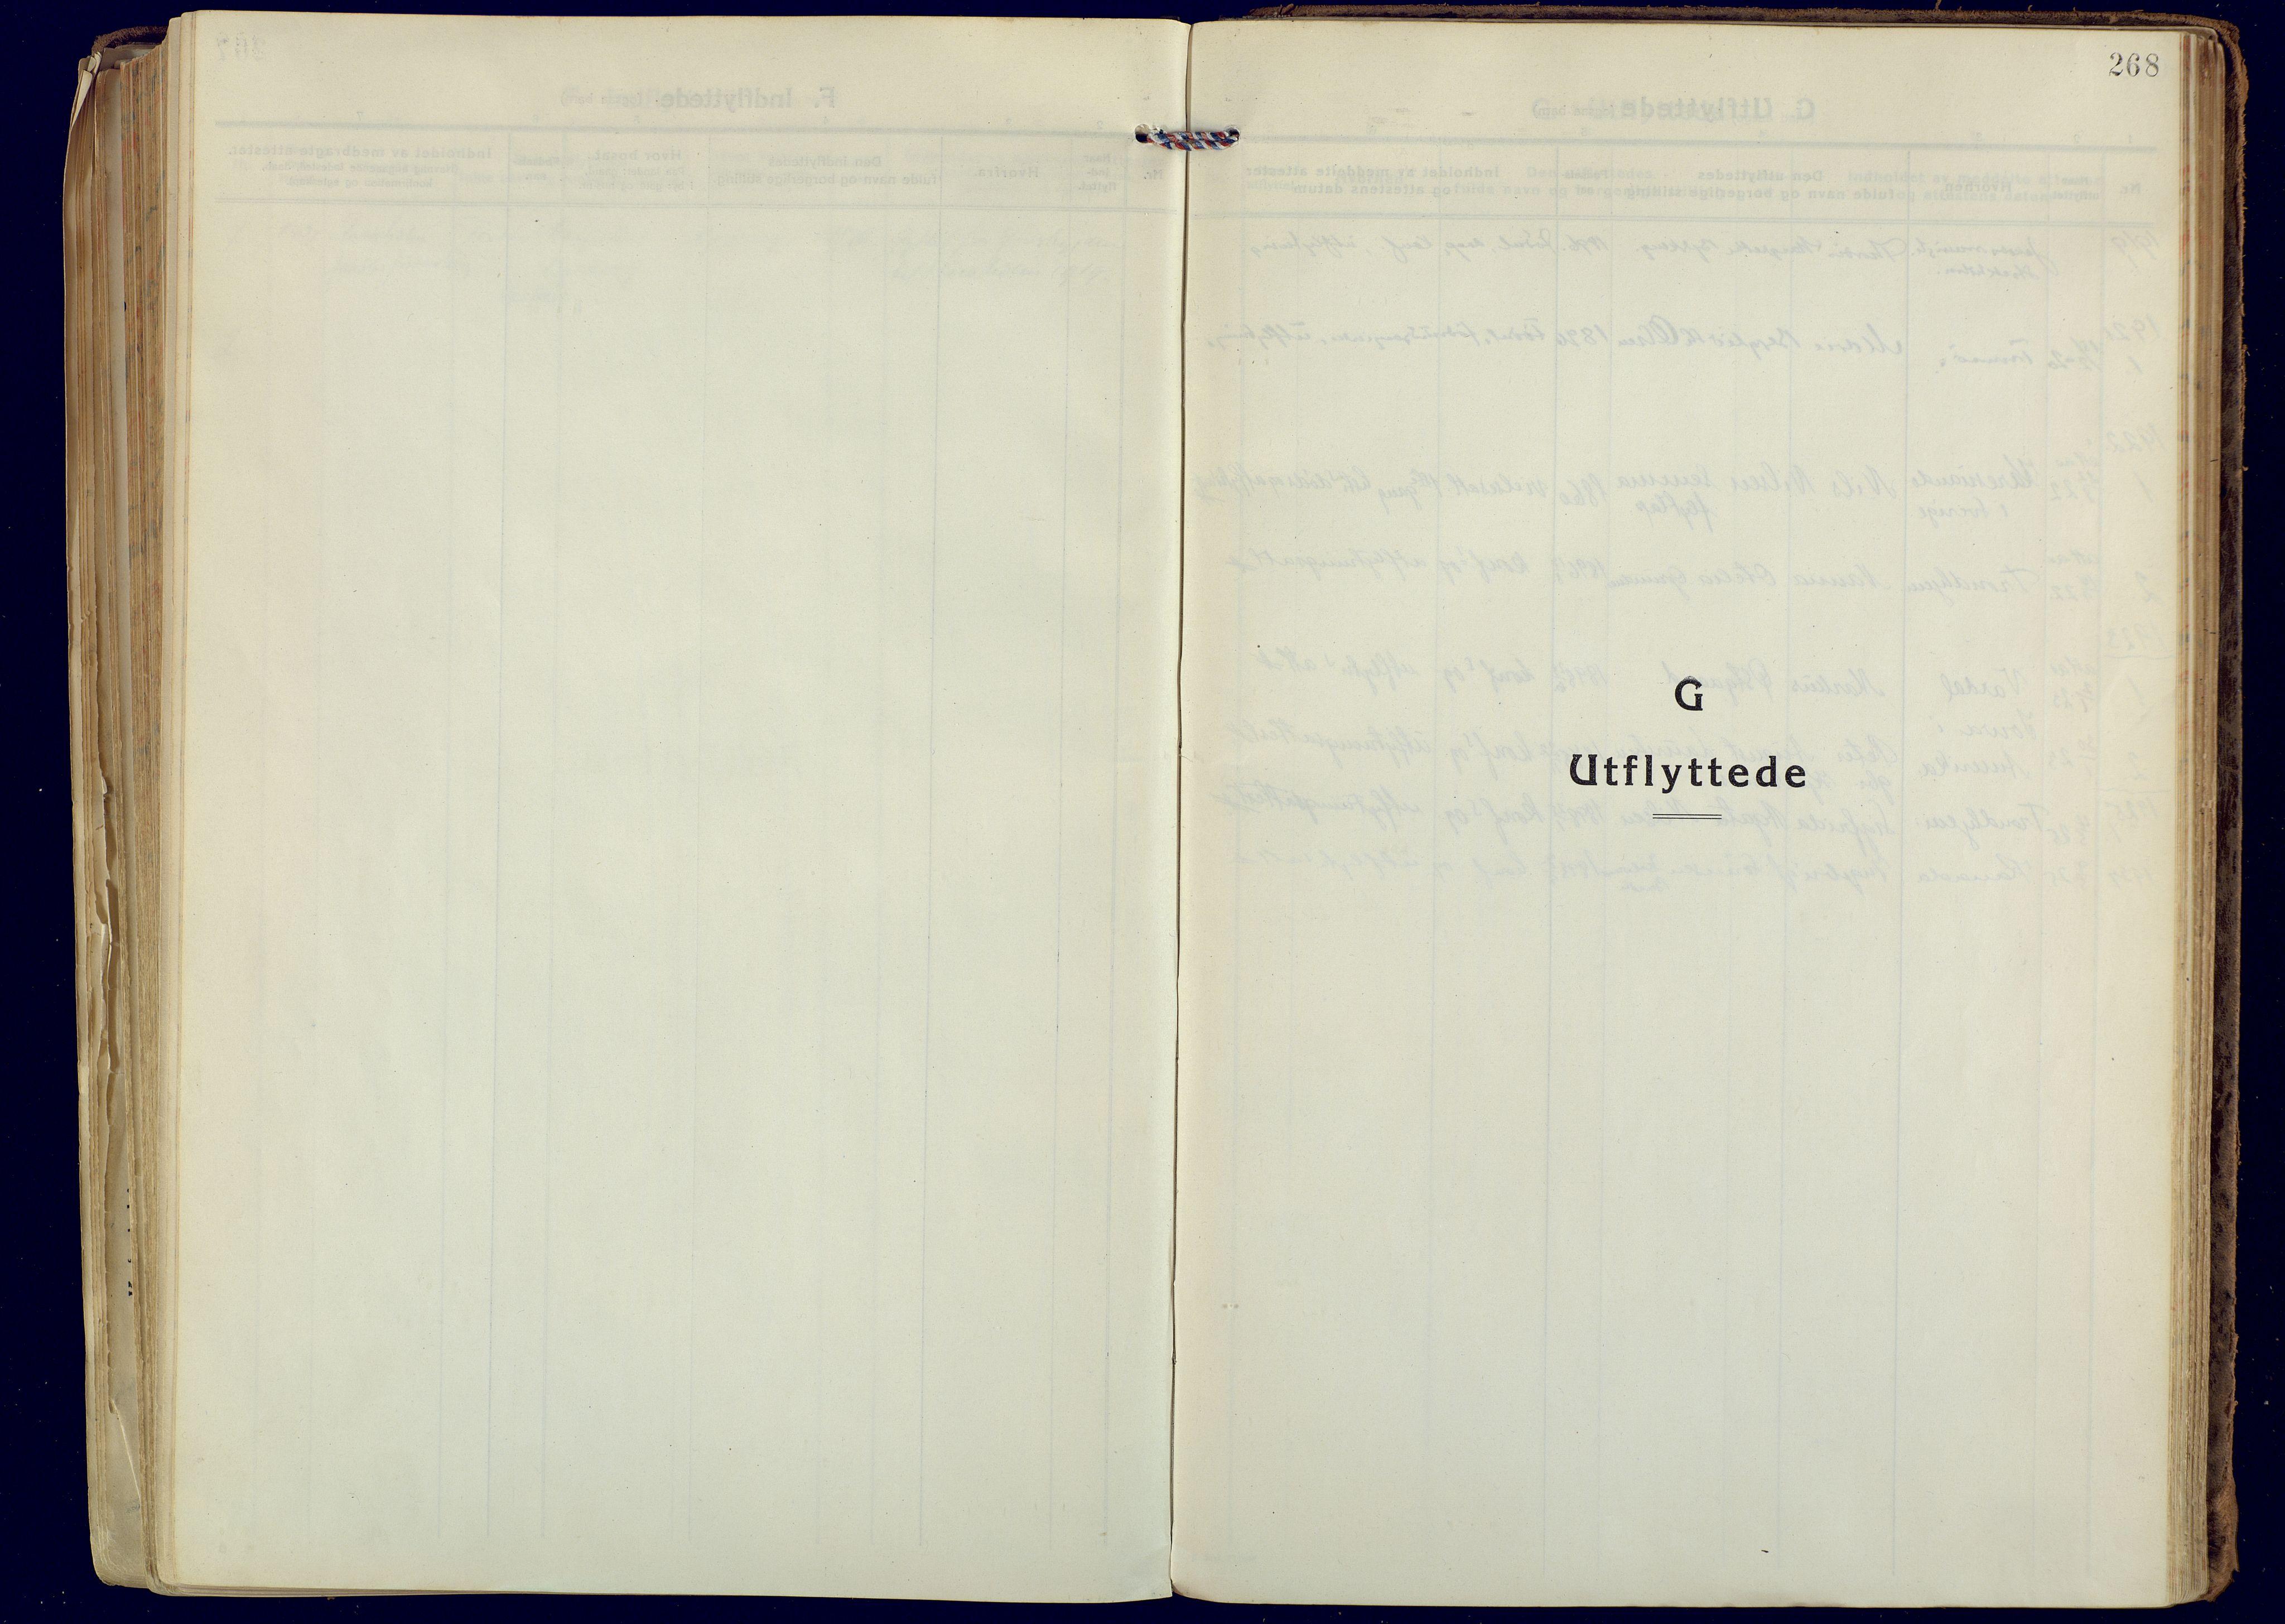 SATØ, Målselv sokneprestembete, Ministerialbok nr. 14, 1919-1932, s. 268